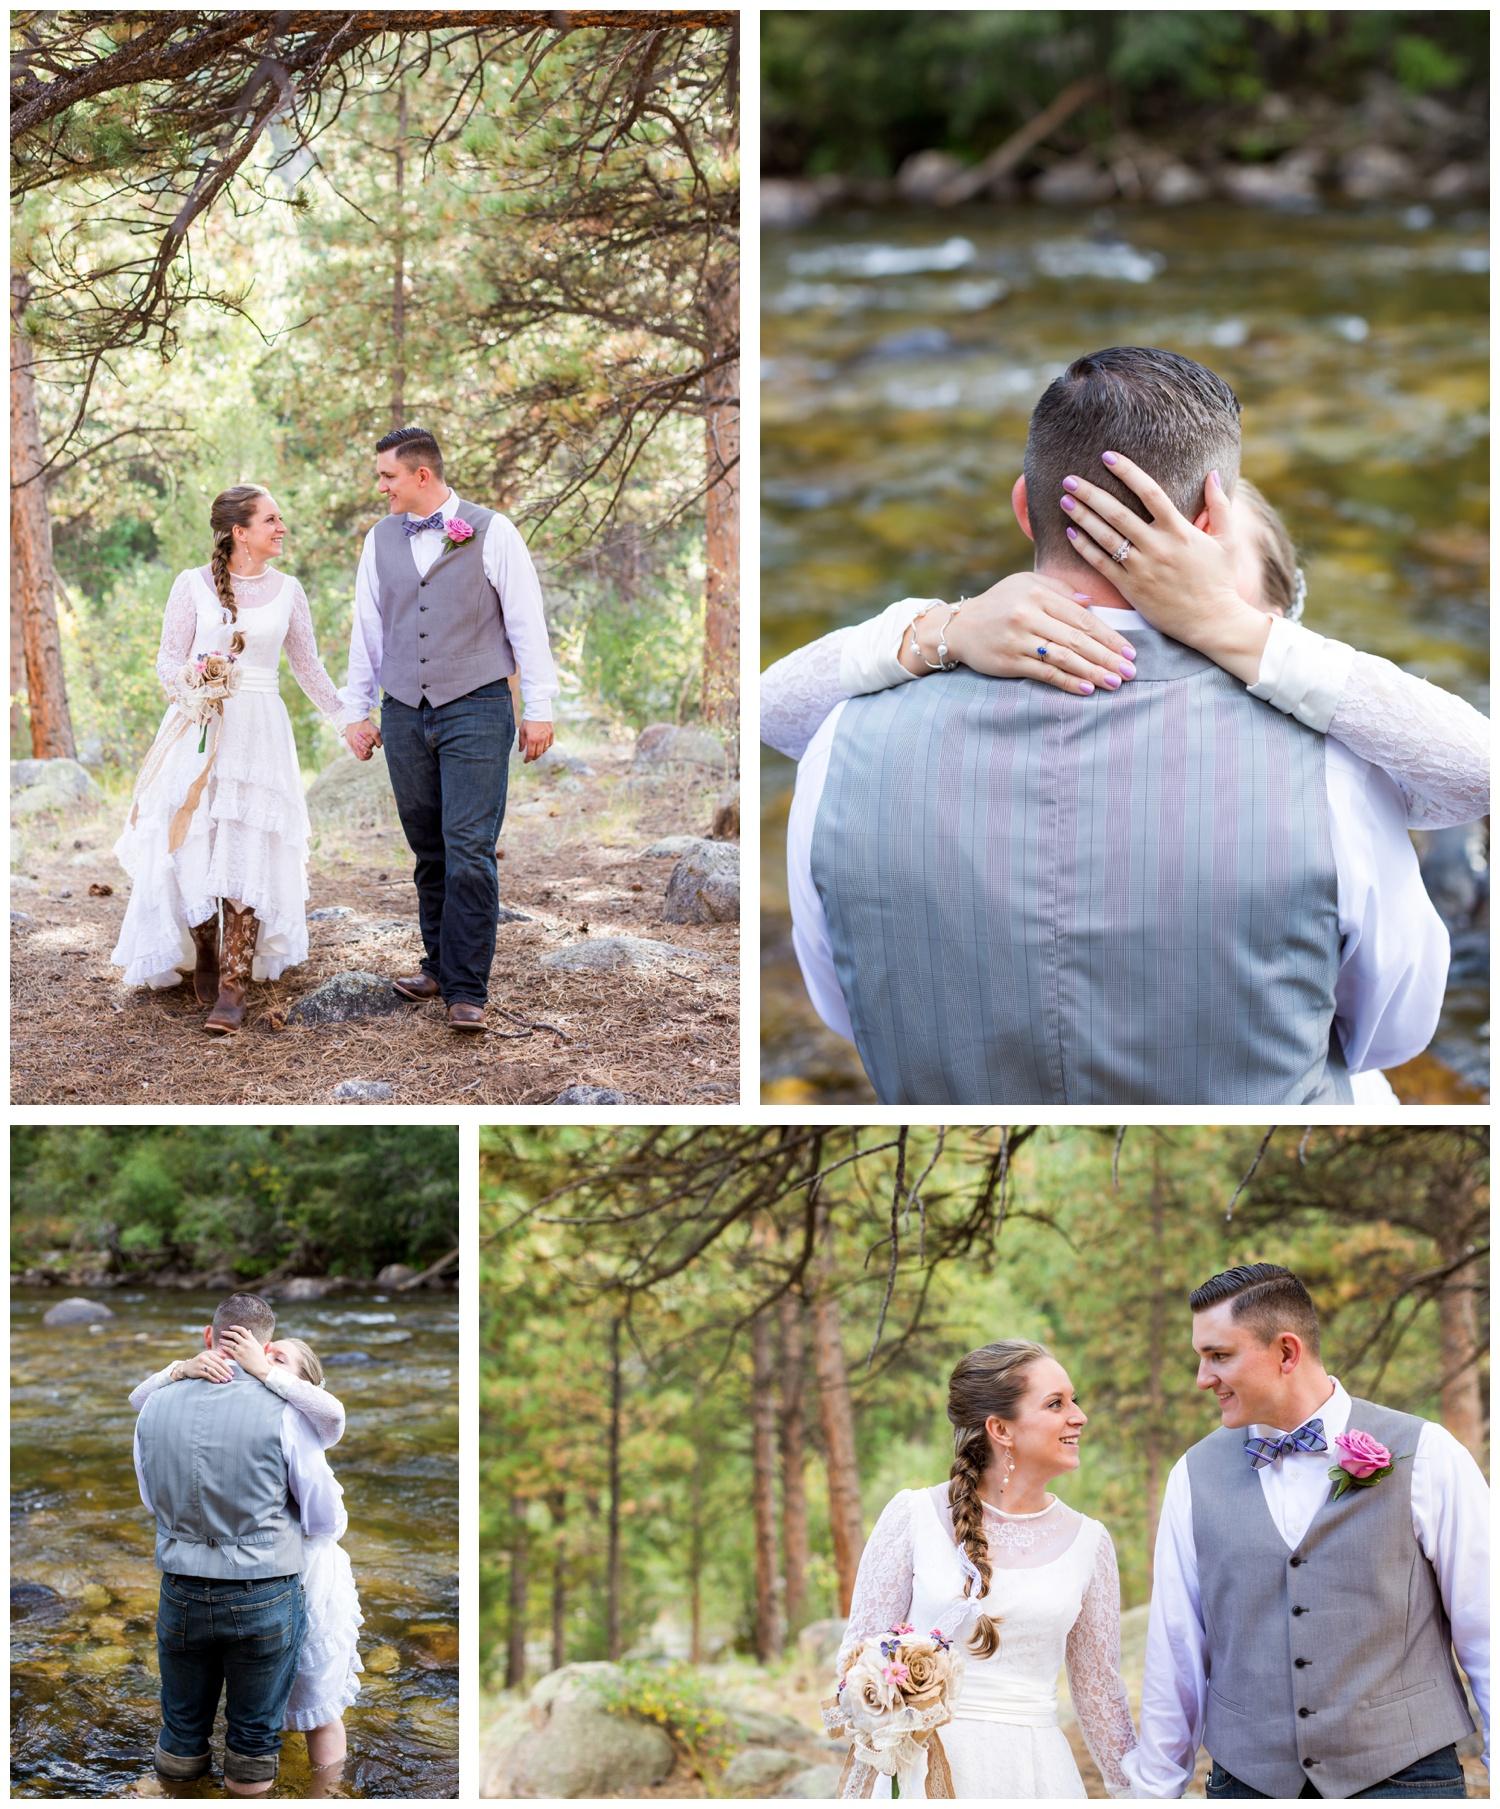 Poudre Canyon Wedding Photography13.jpg